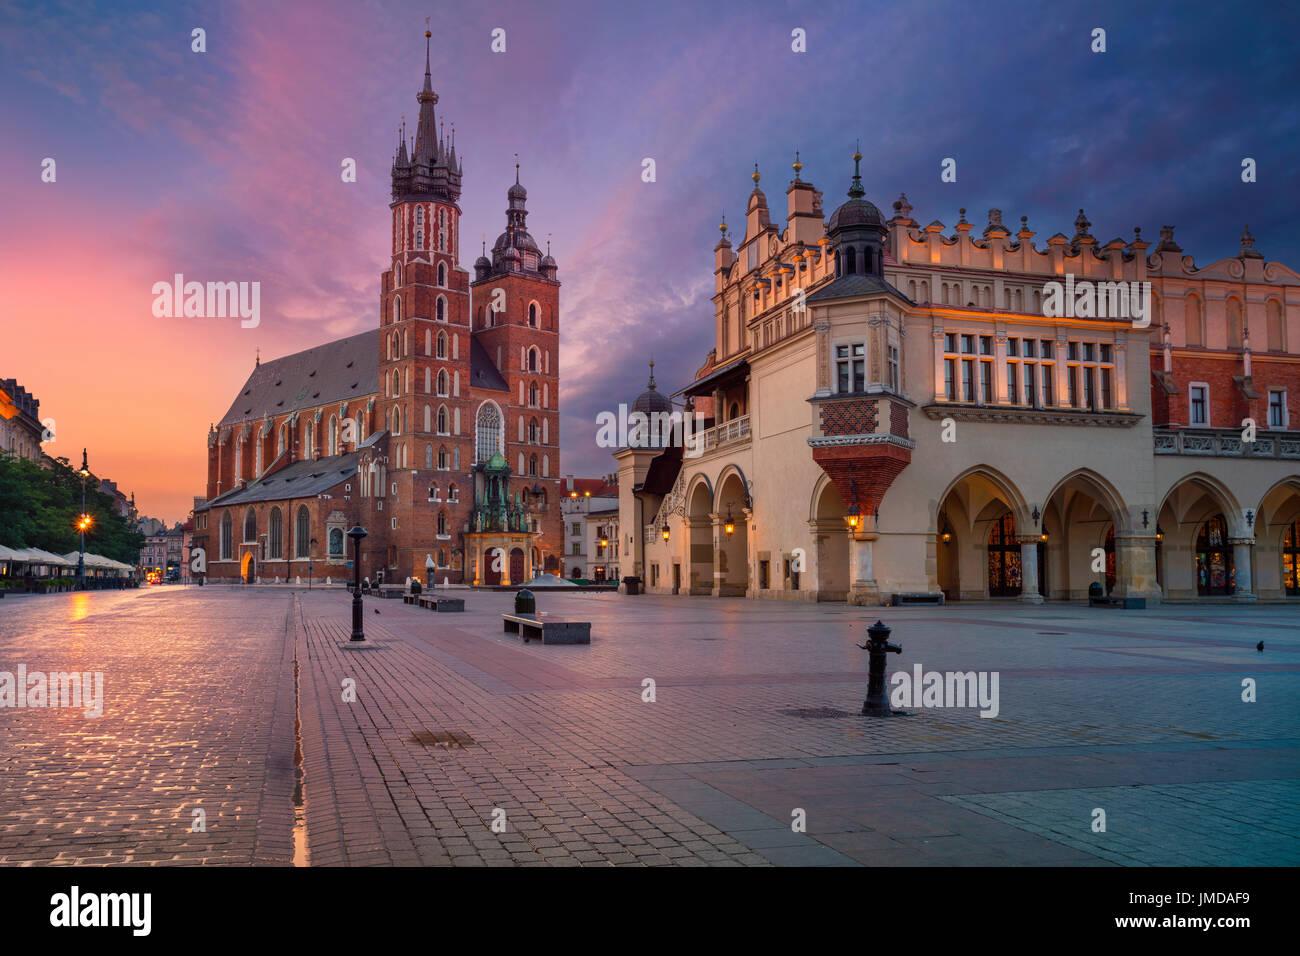 Krakow. Image of old town Krakow, Poland during sunrise. - Stock Image